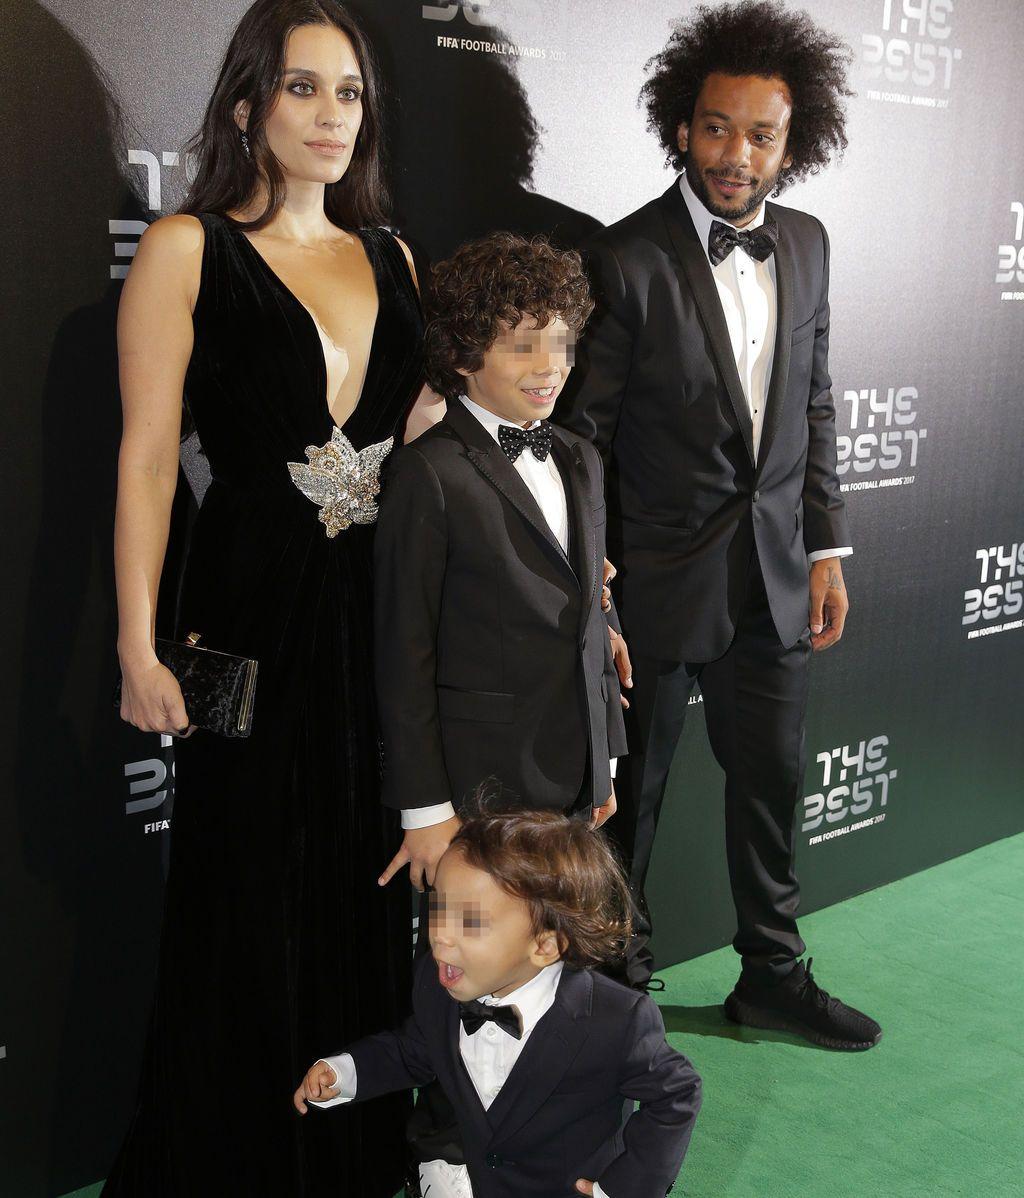 Cristiano, Georgina, Pilar Rubio... La intrahistoria de la gala The Best, en fotos